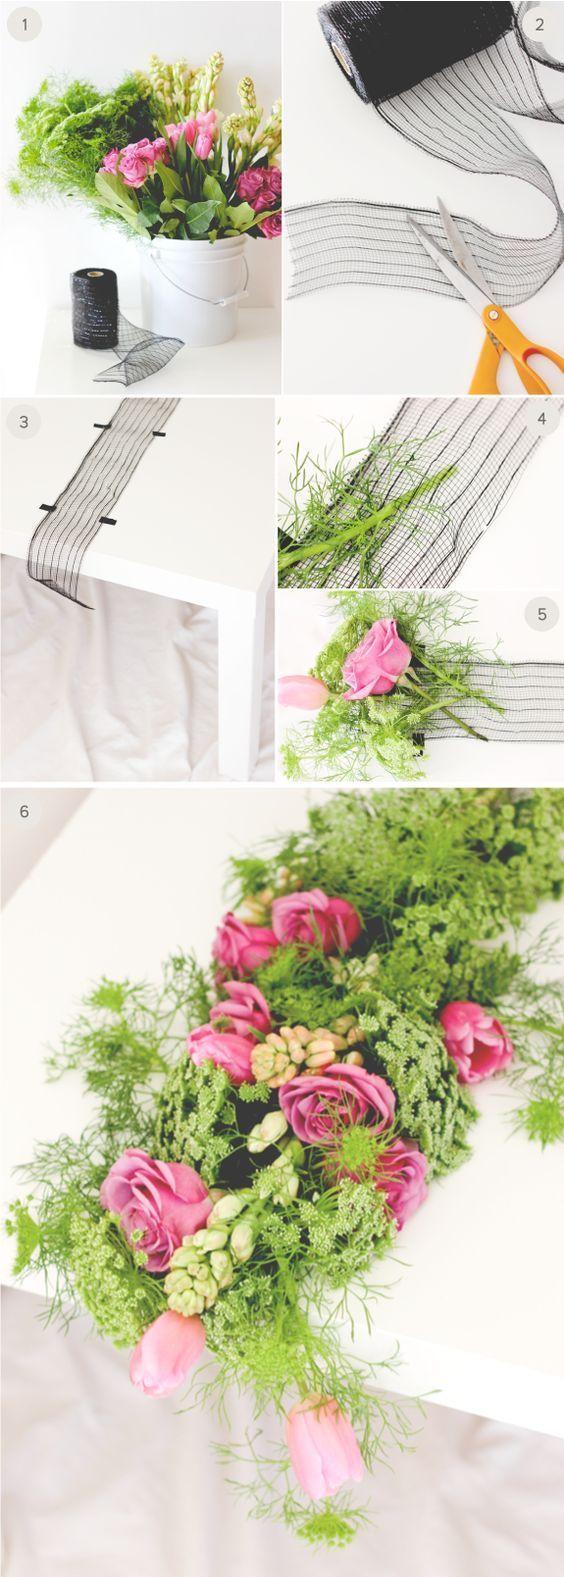 DIY Wedding fresh floral table runner / http://www.himisspuff.com/diy-wedding-centerpieces-on-a-budget/34/